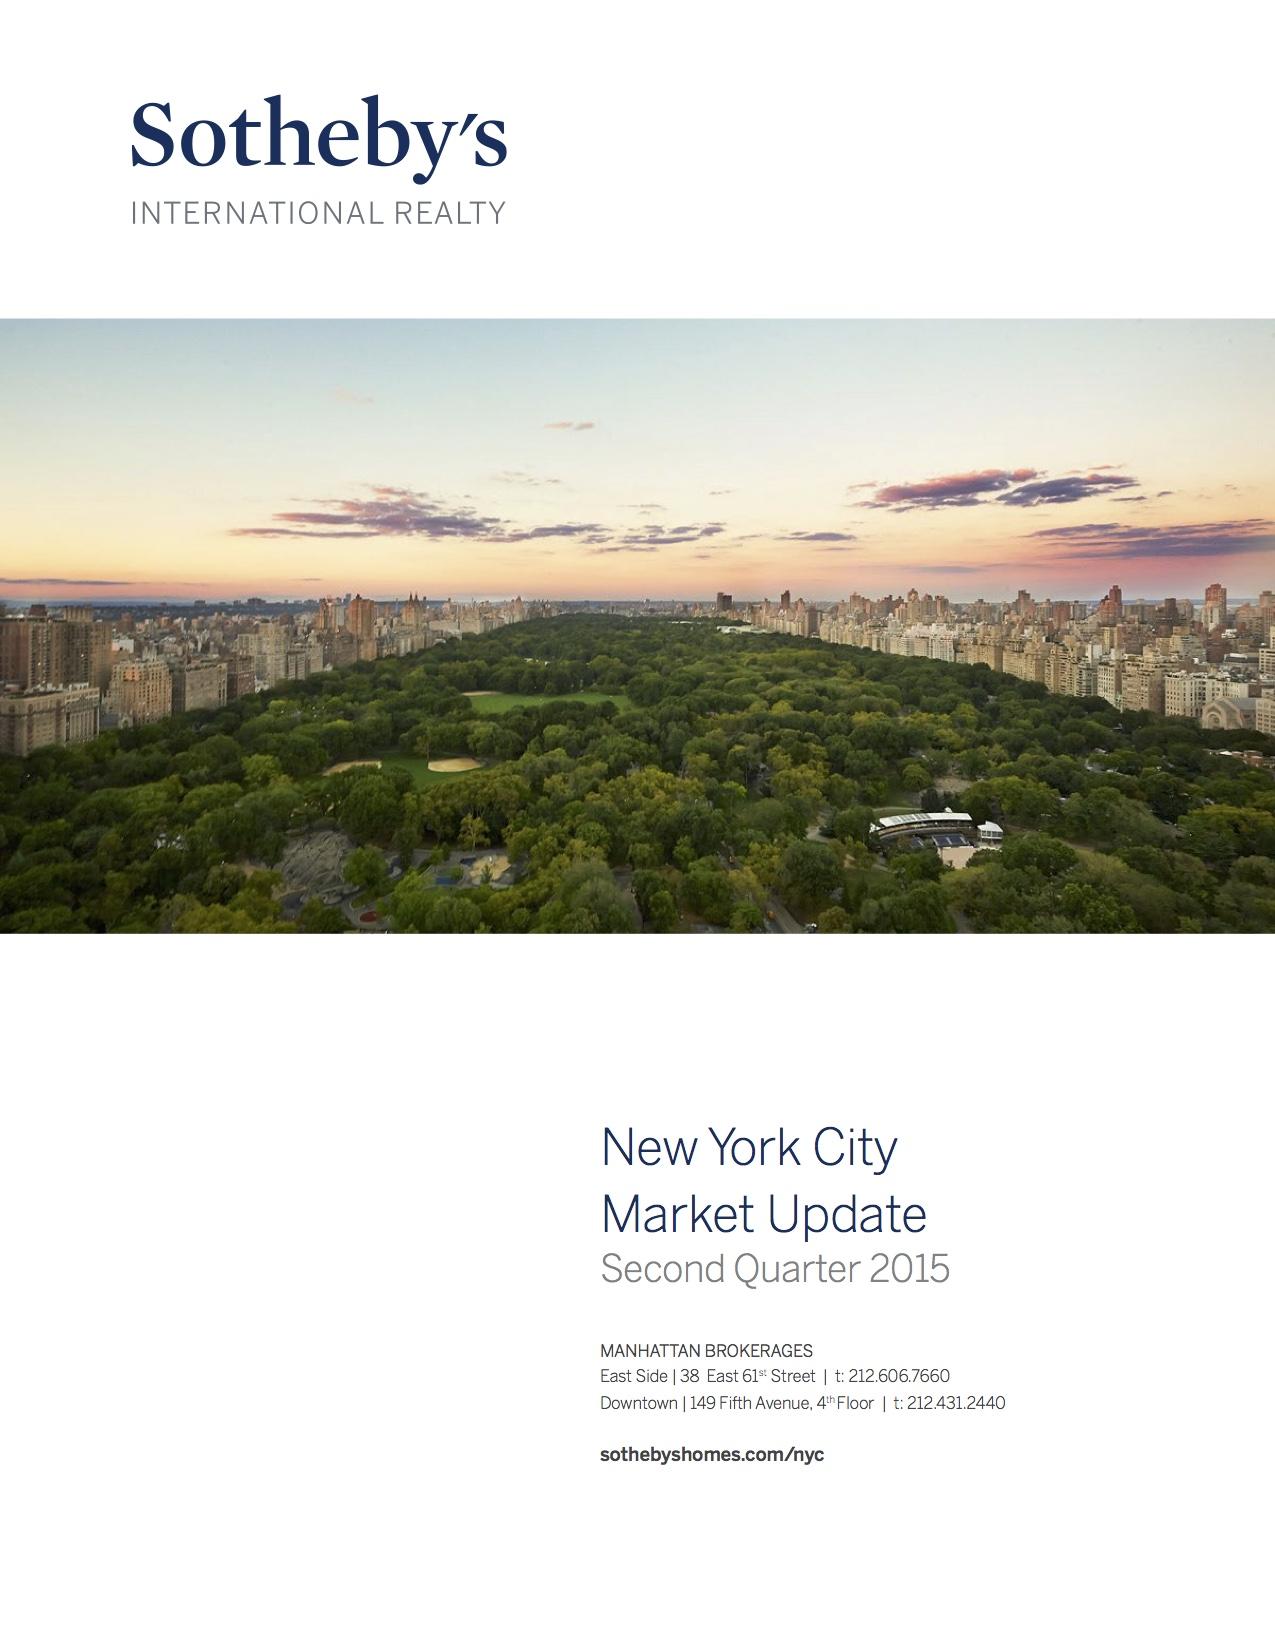 SothebysInternationalRealty_Manhattan_MarketReport_2Q2015_1.jpg